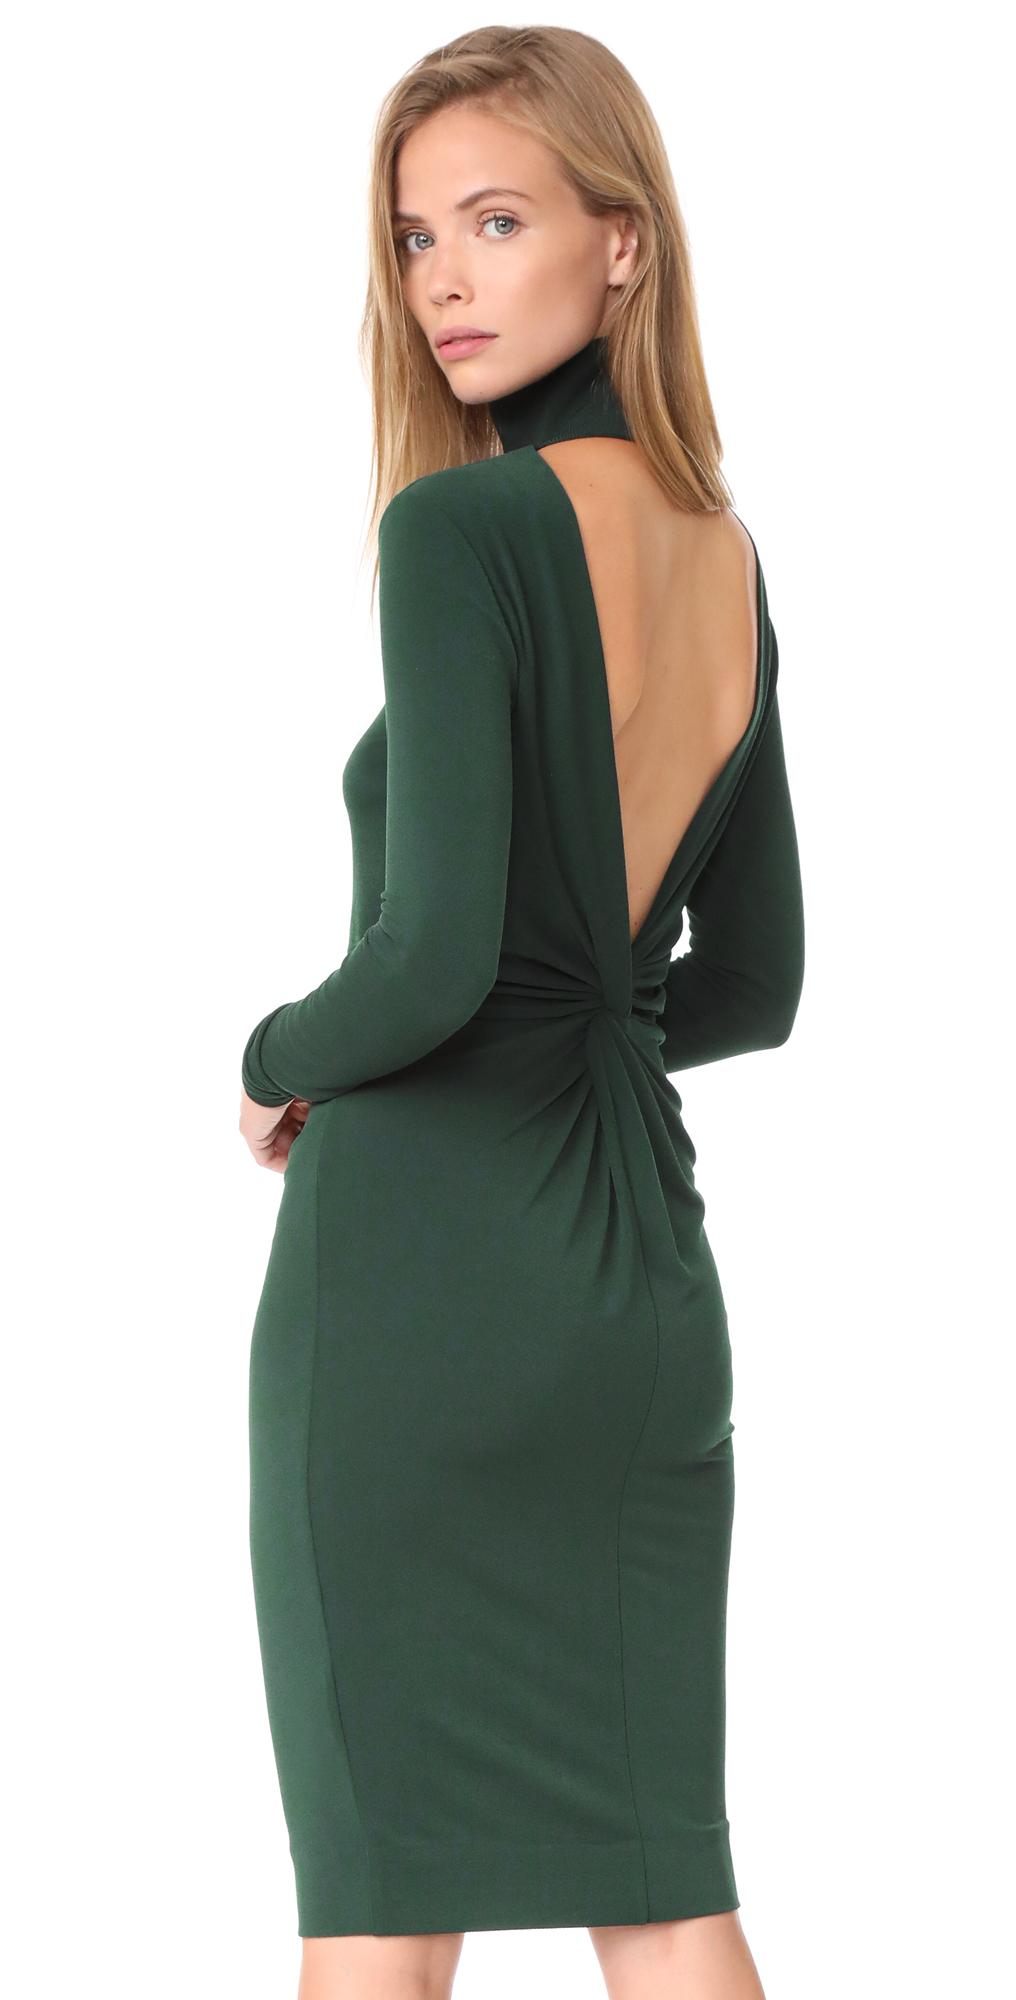 Tirio Open Back Dress By Malene Birger